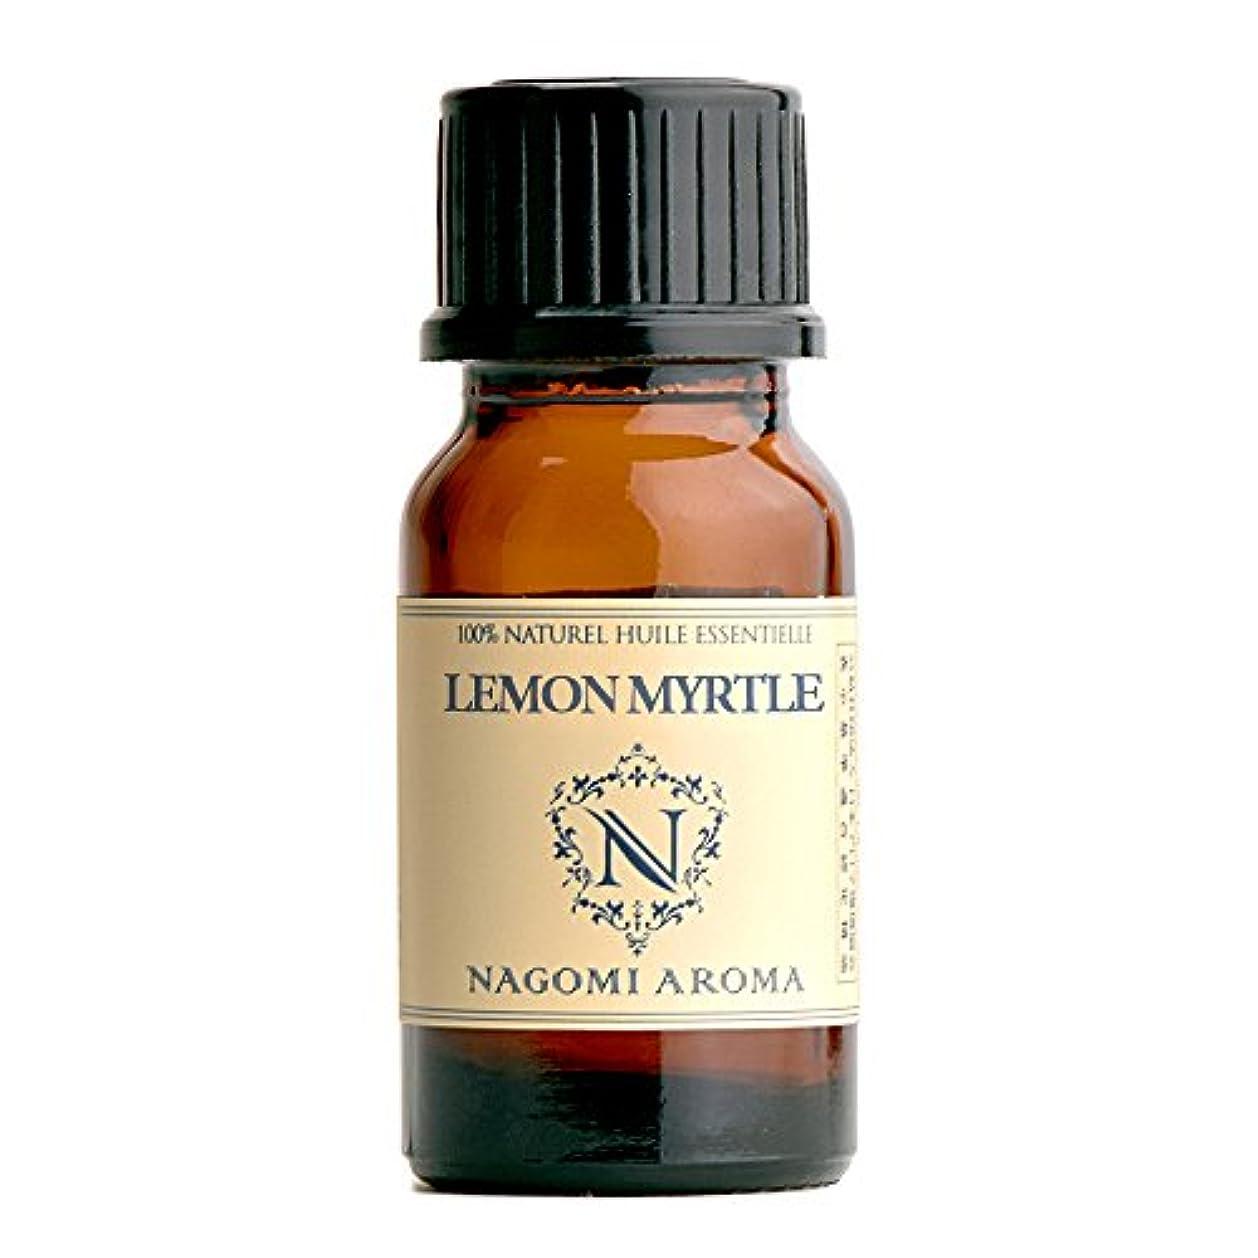 NAGOMI AROMA レモンマートル 10ml 【AEAJ認定精油】【アロマオイル】